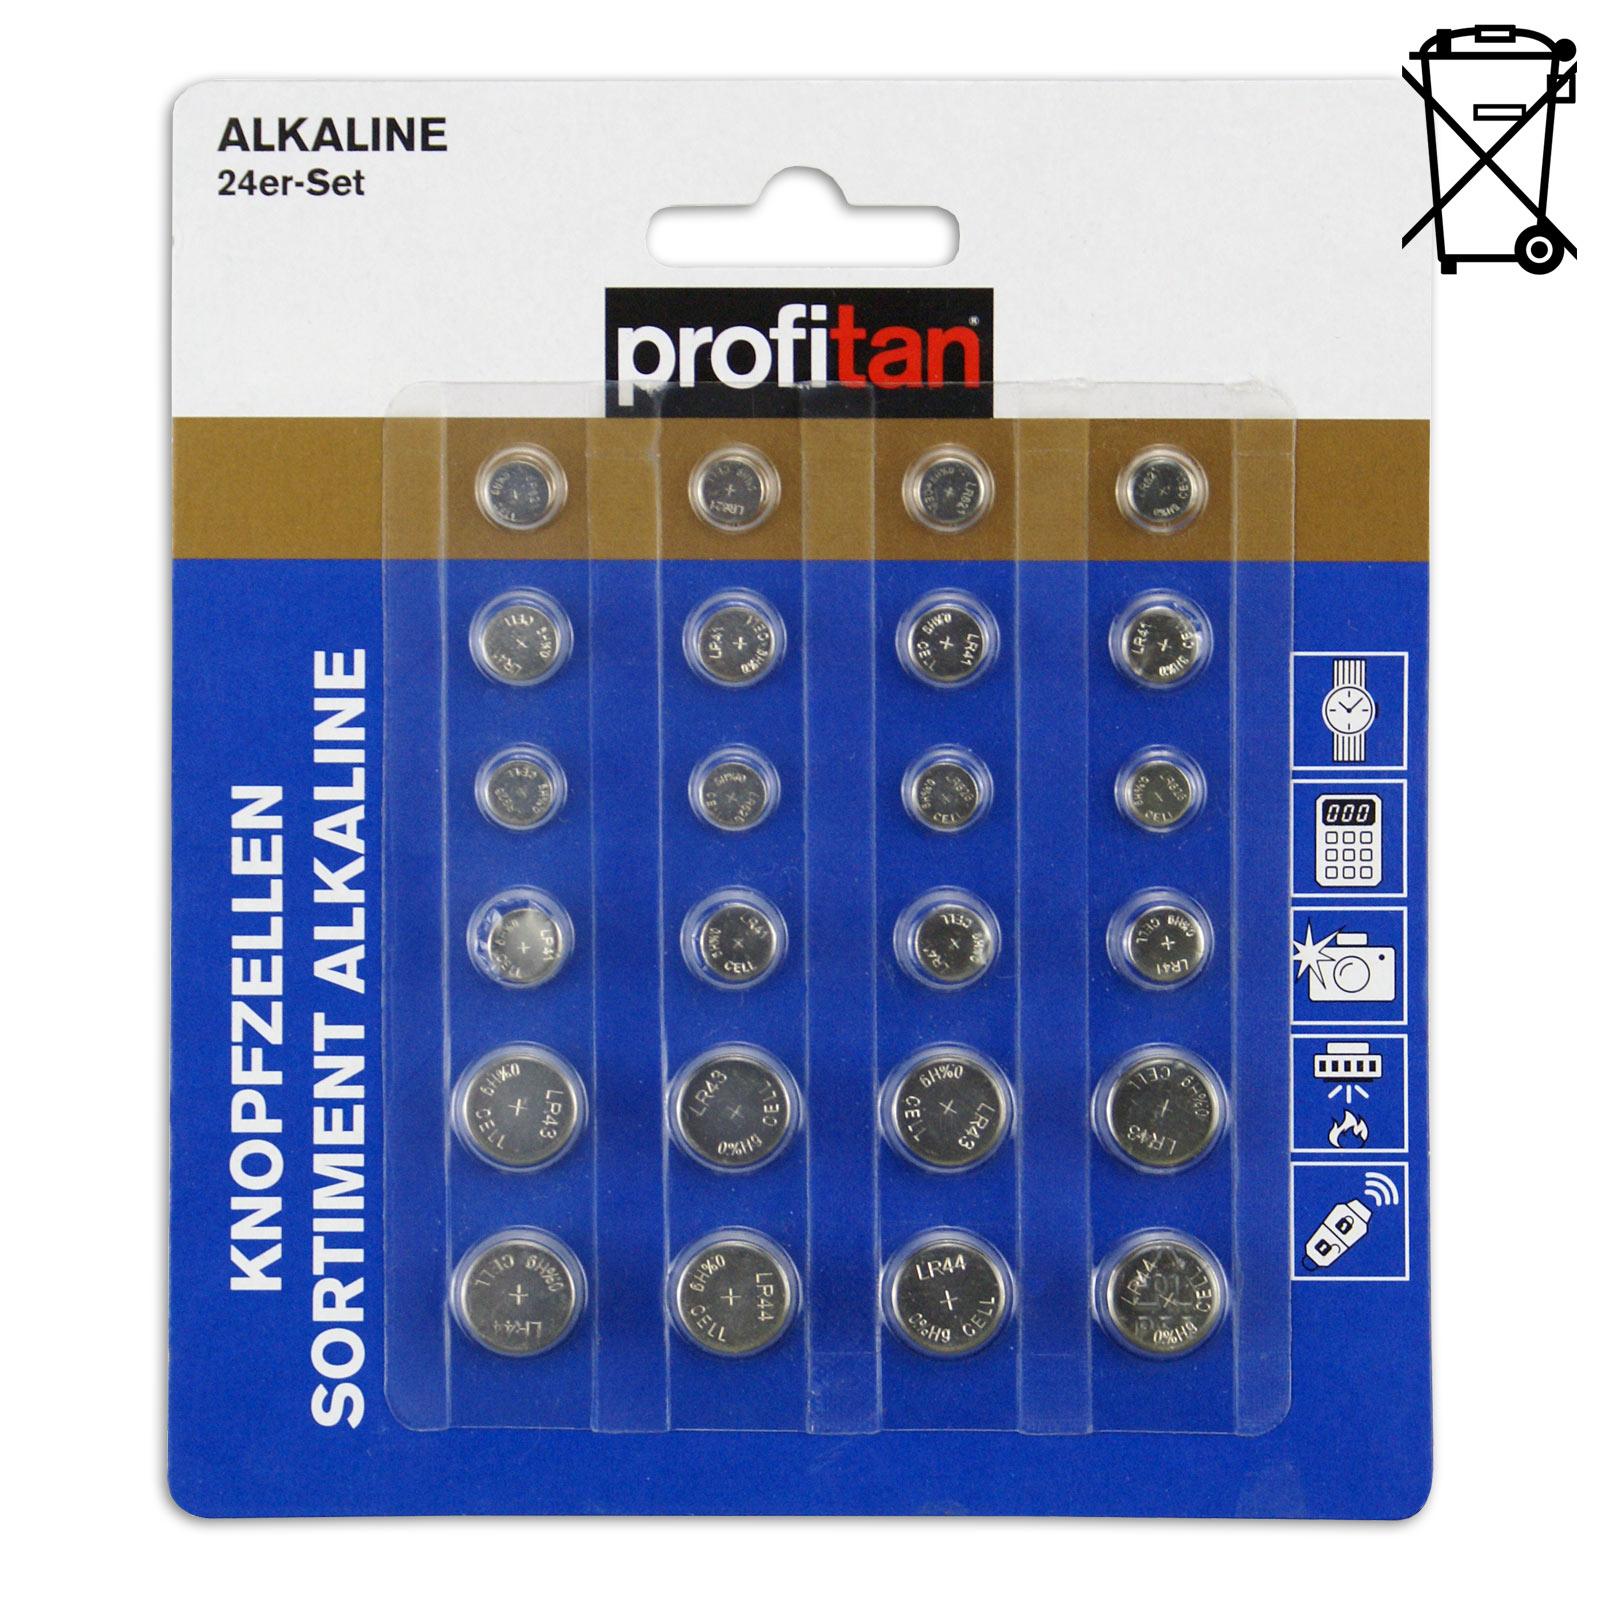 Alkaline 24 Stück ROLLER Knopfzellen-Sortiment